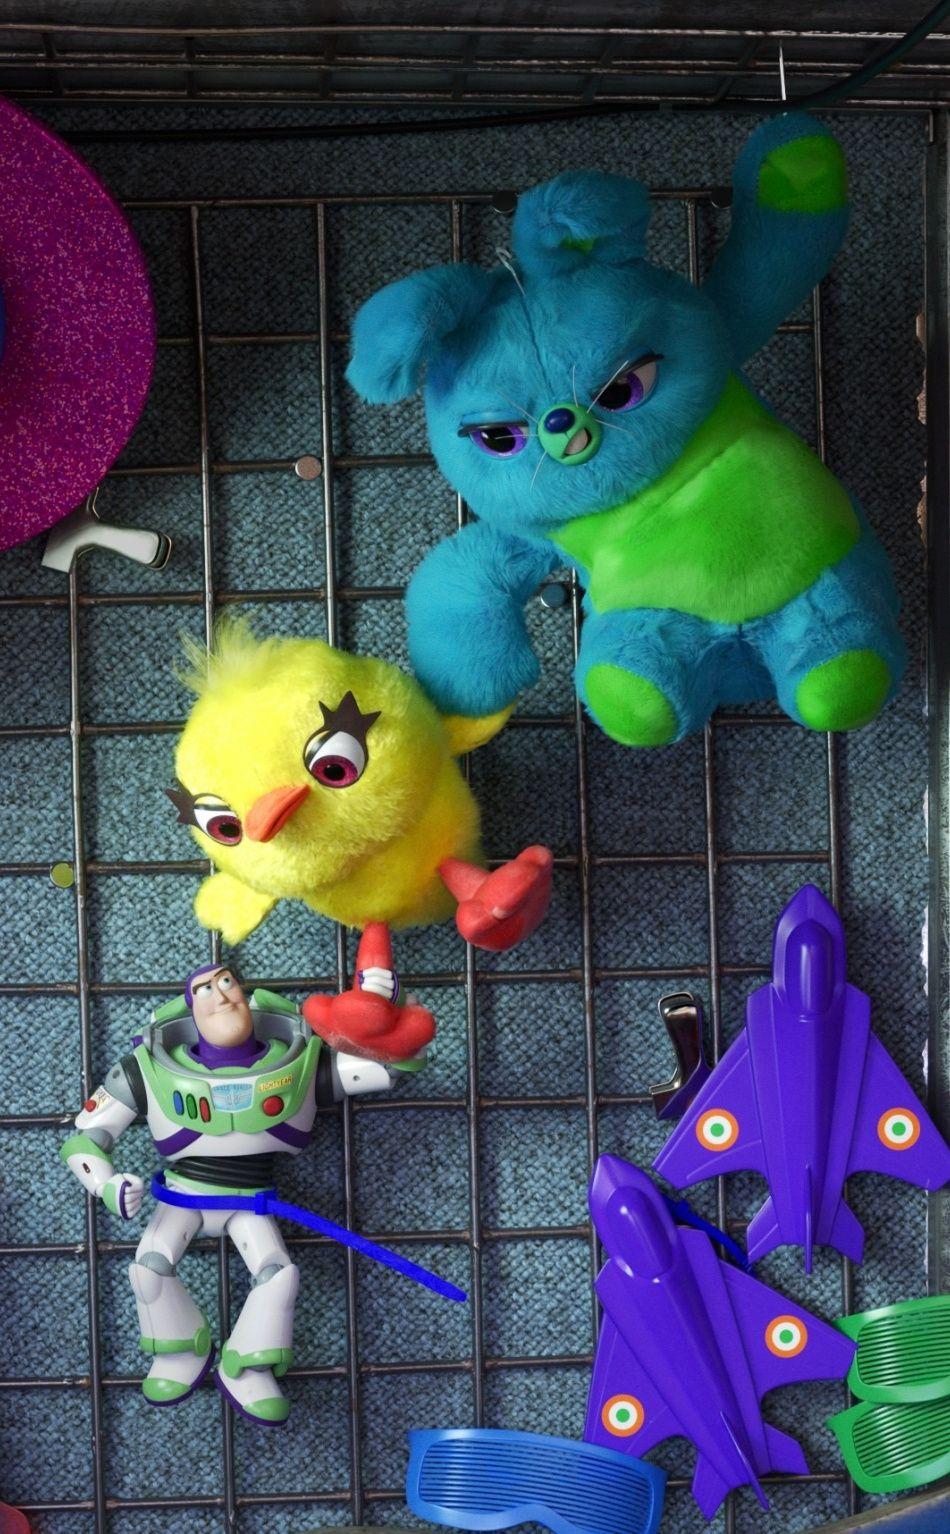 Toy Story 4, buzz lightyear, fluffy toys, movie Wallpaper